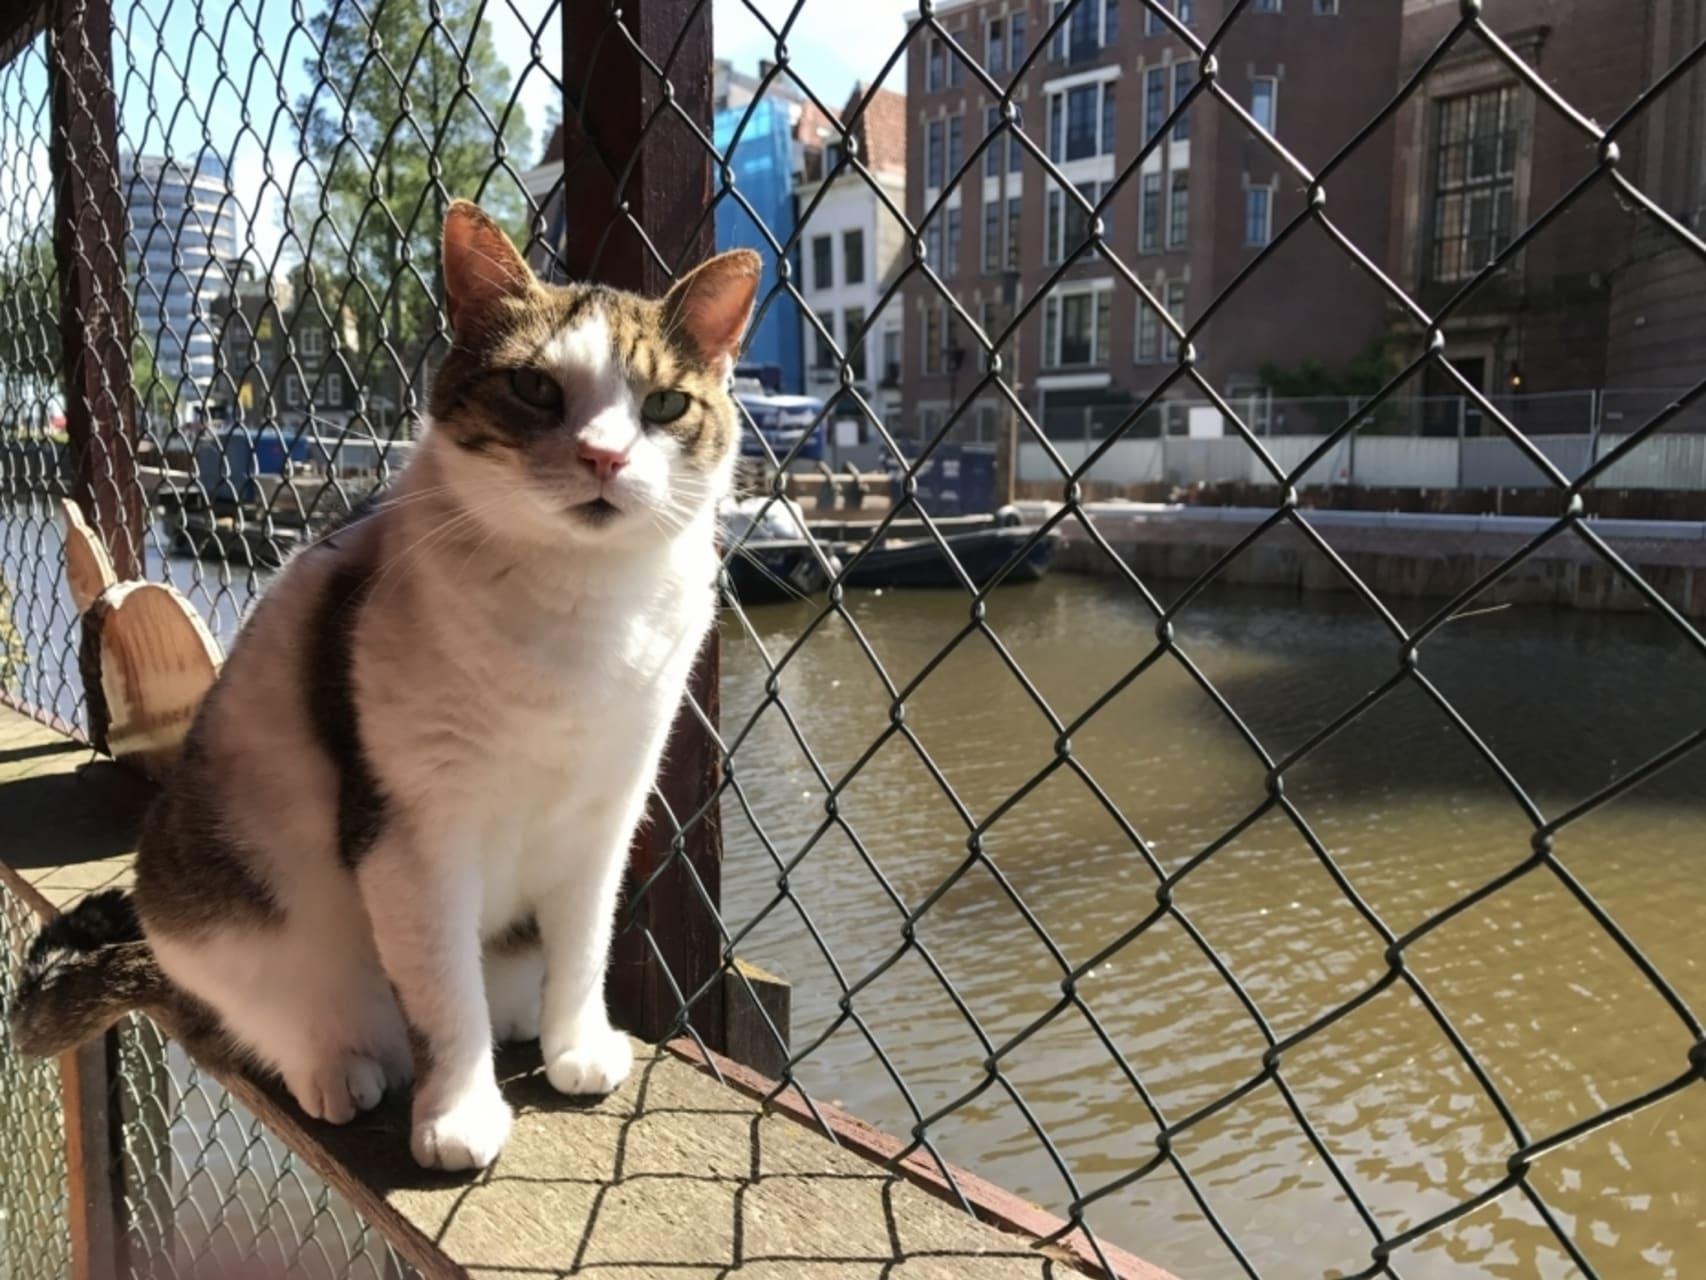 Amsterdam - Amsterdam's Famous Poezenboot (Cat Boat!) Fundraiser